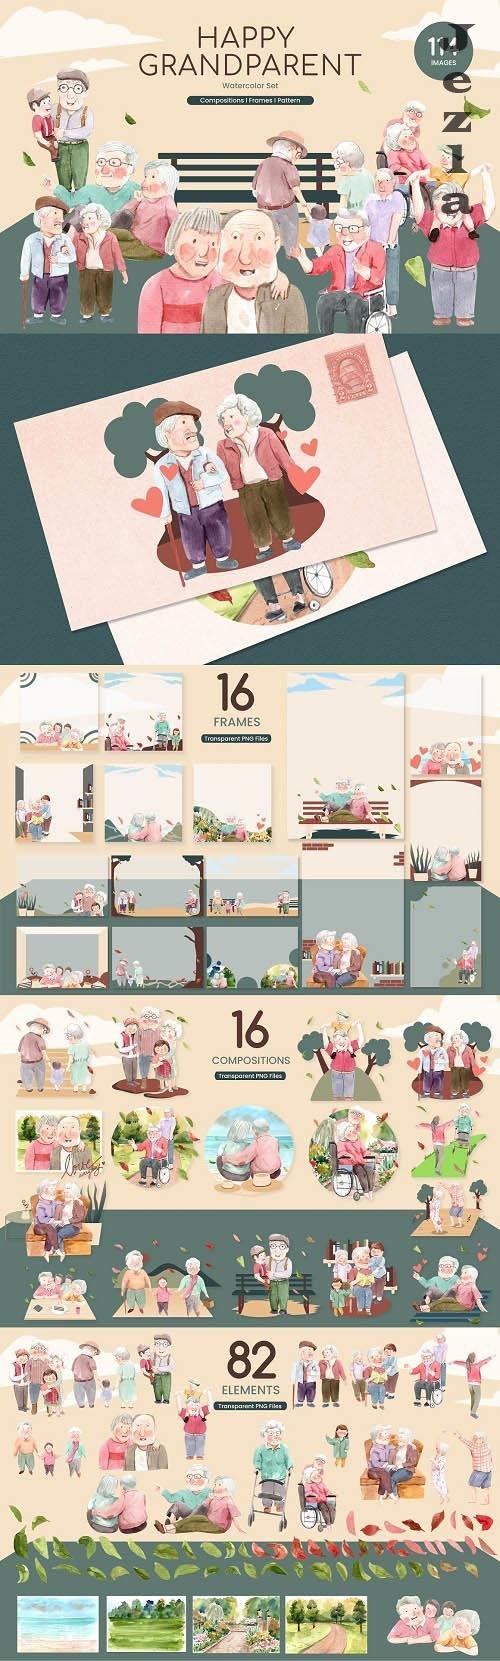 Happy Grandparent Day Watercolor - 6245886